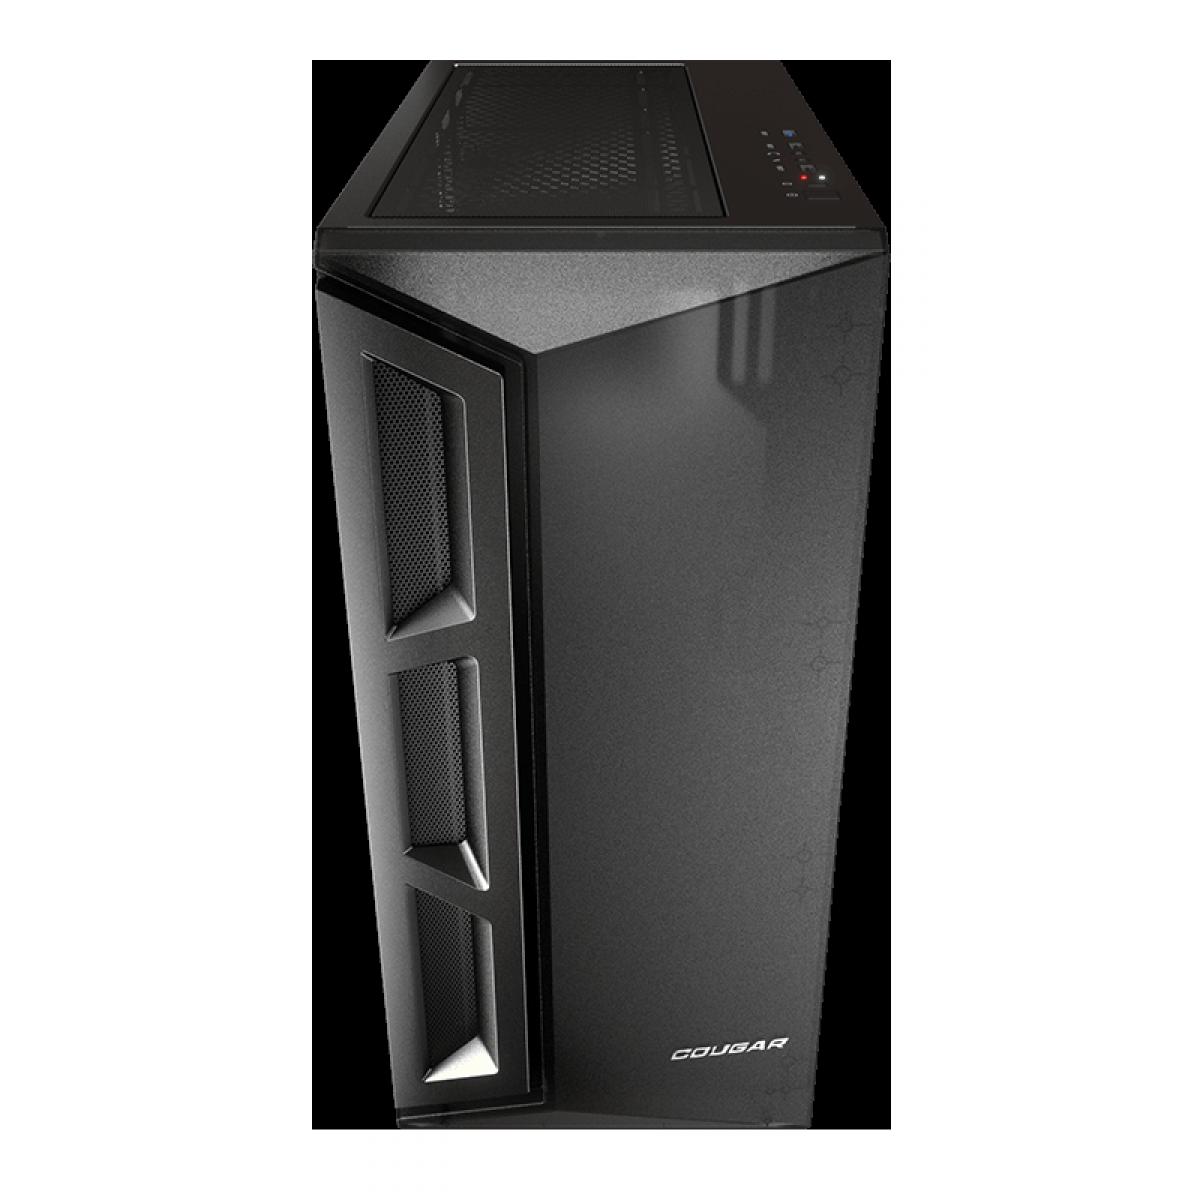 Gabinete Gamer Cougar DarkBlader X5, Mid Tower, Vidro Temperado, Black, ATX, Sem Fonte, Com 1 Fan, 385UM30-0001